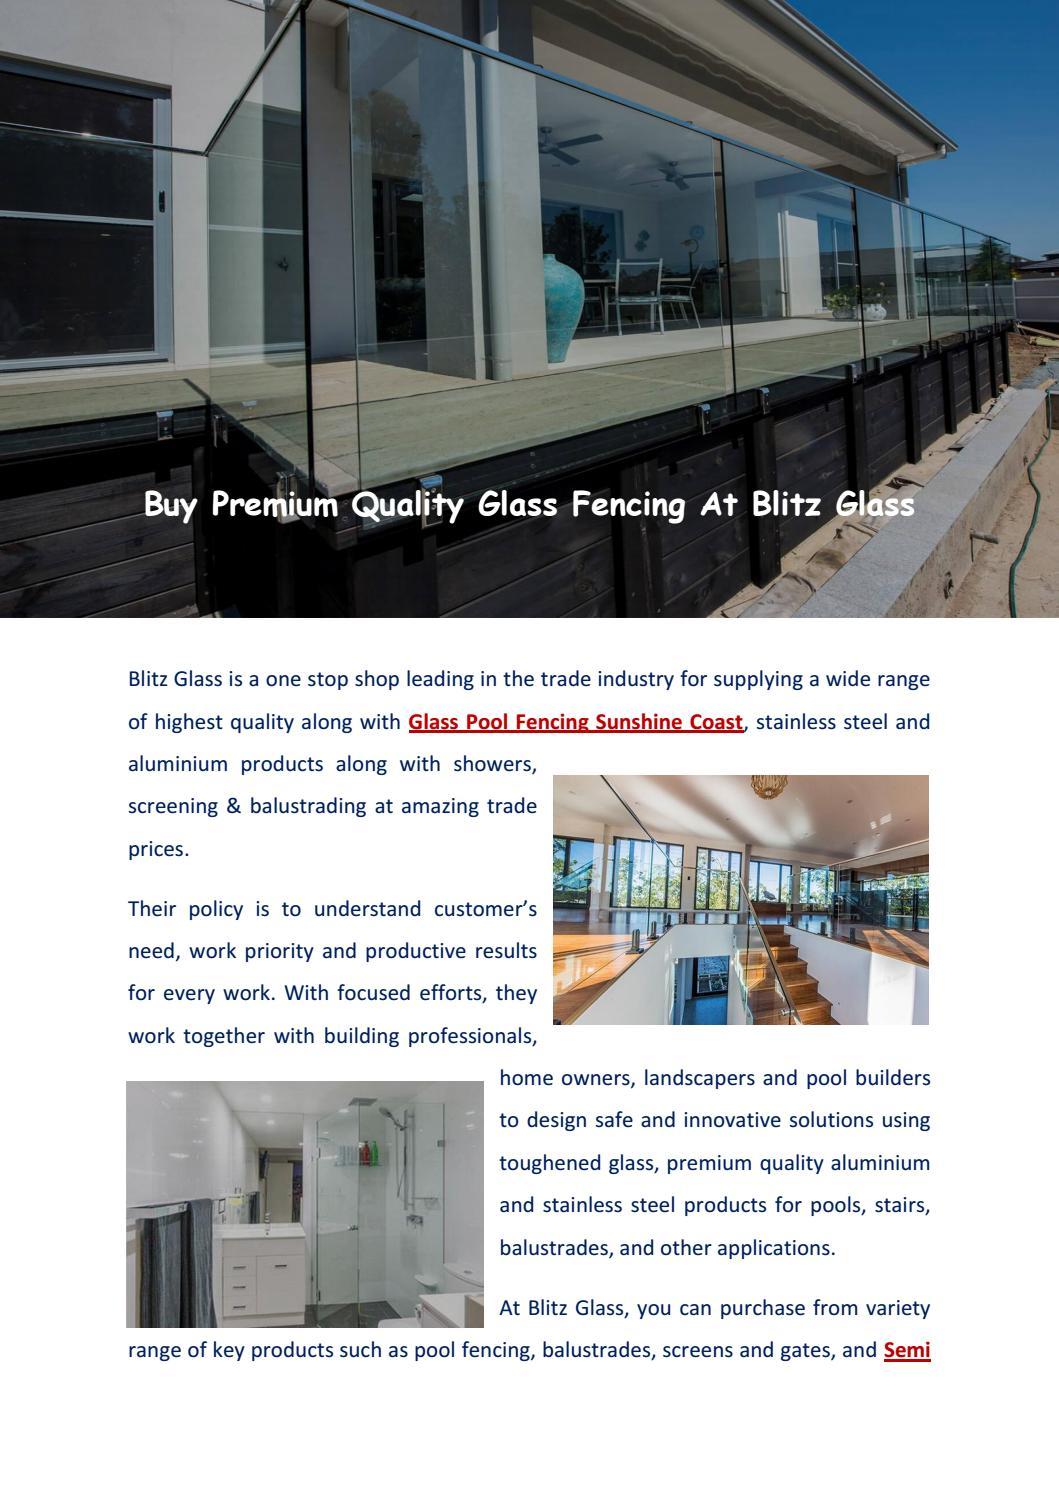 Glass Pool Fencing Sunshine Coast Blitzglass By Blitz Glass Issuu